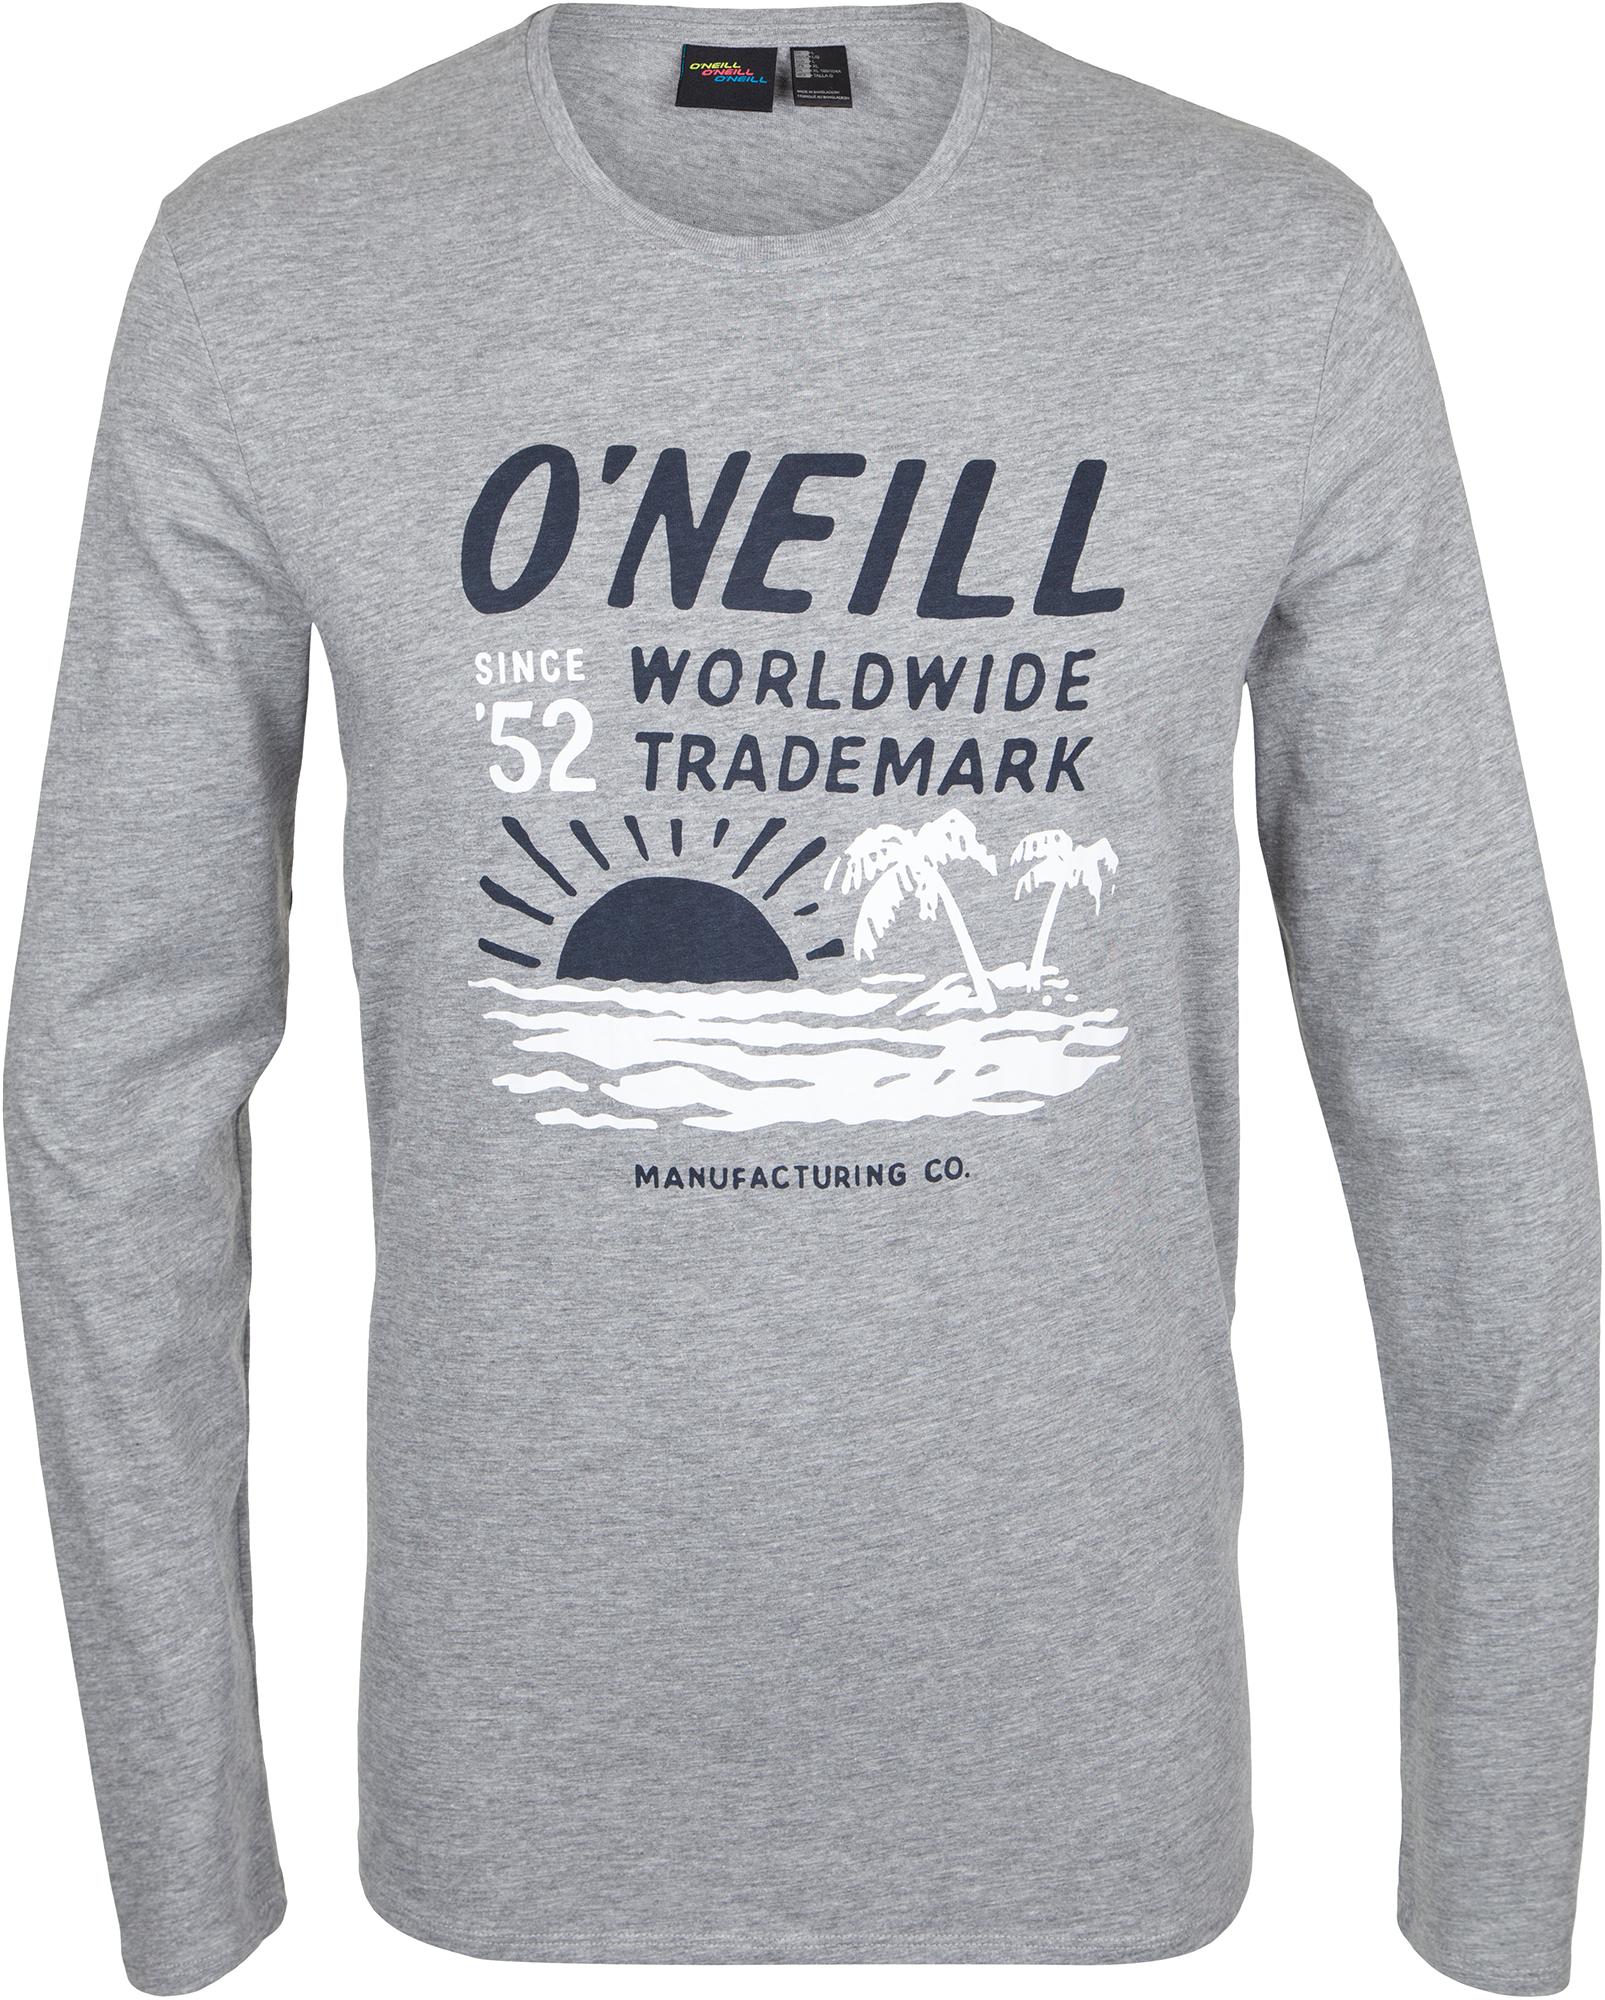 O'Neill Футболка с длинным рукавом мужская O'Neill Lm, размер 54-56